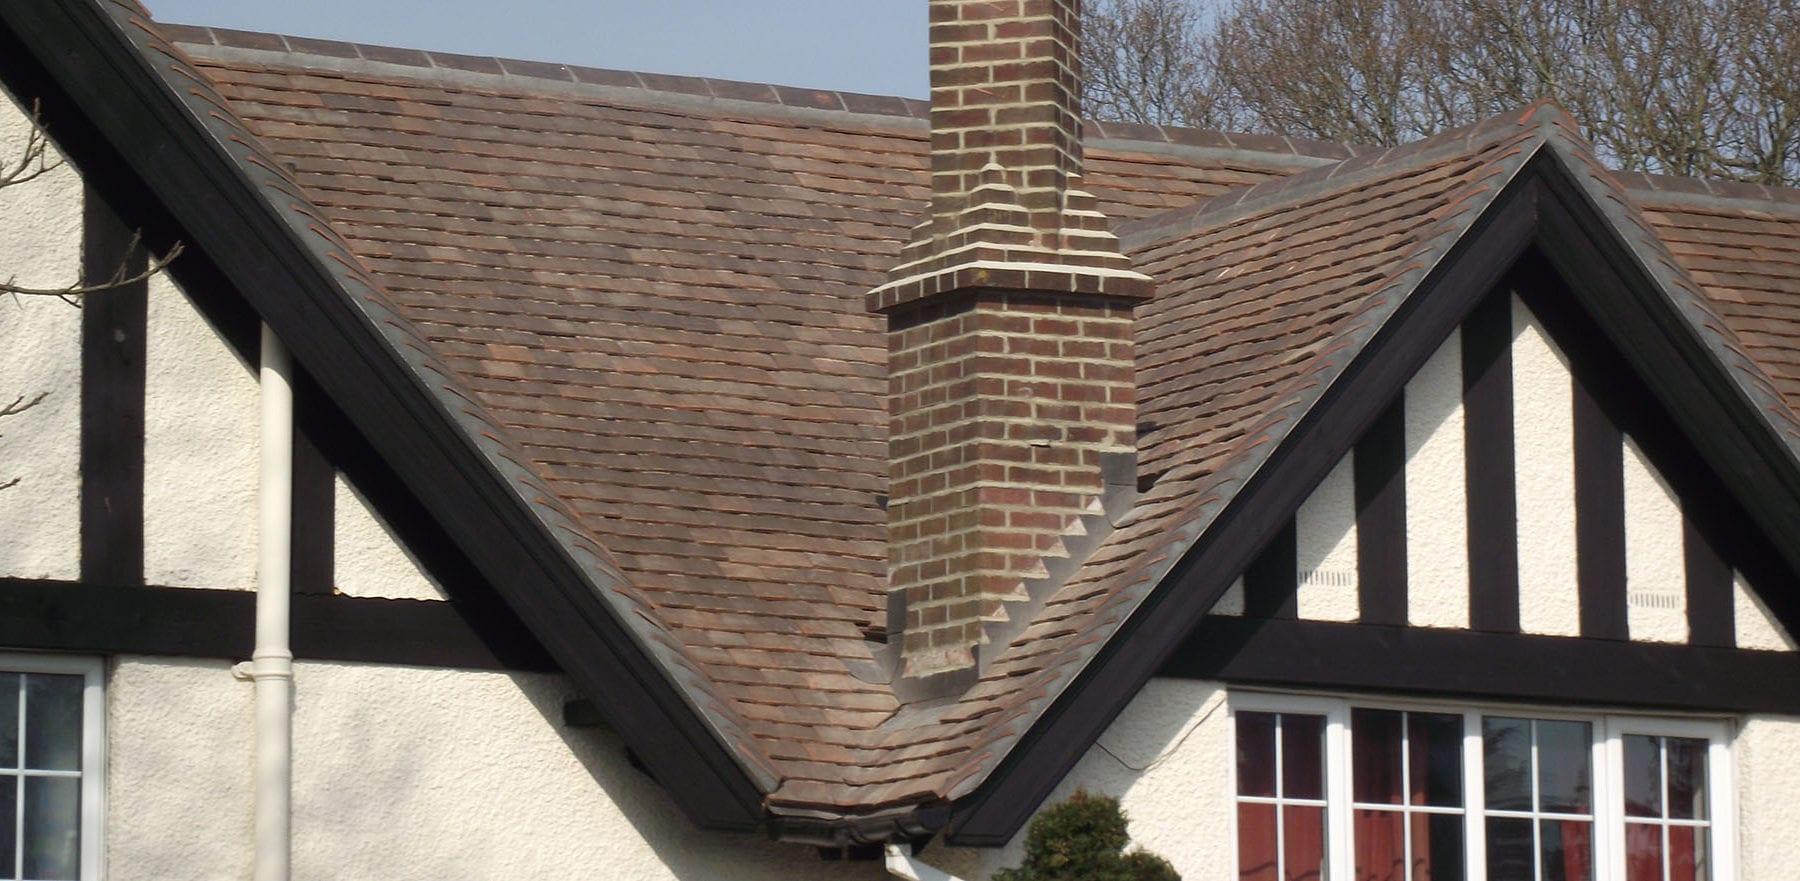 Lifestiles - Handmade Restoration Clay Roof Tiles - Cuckfield, England 3